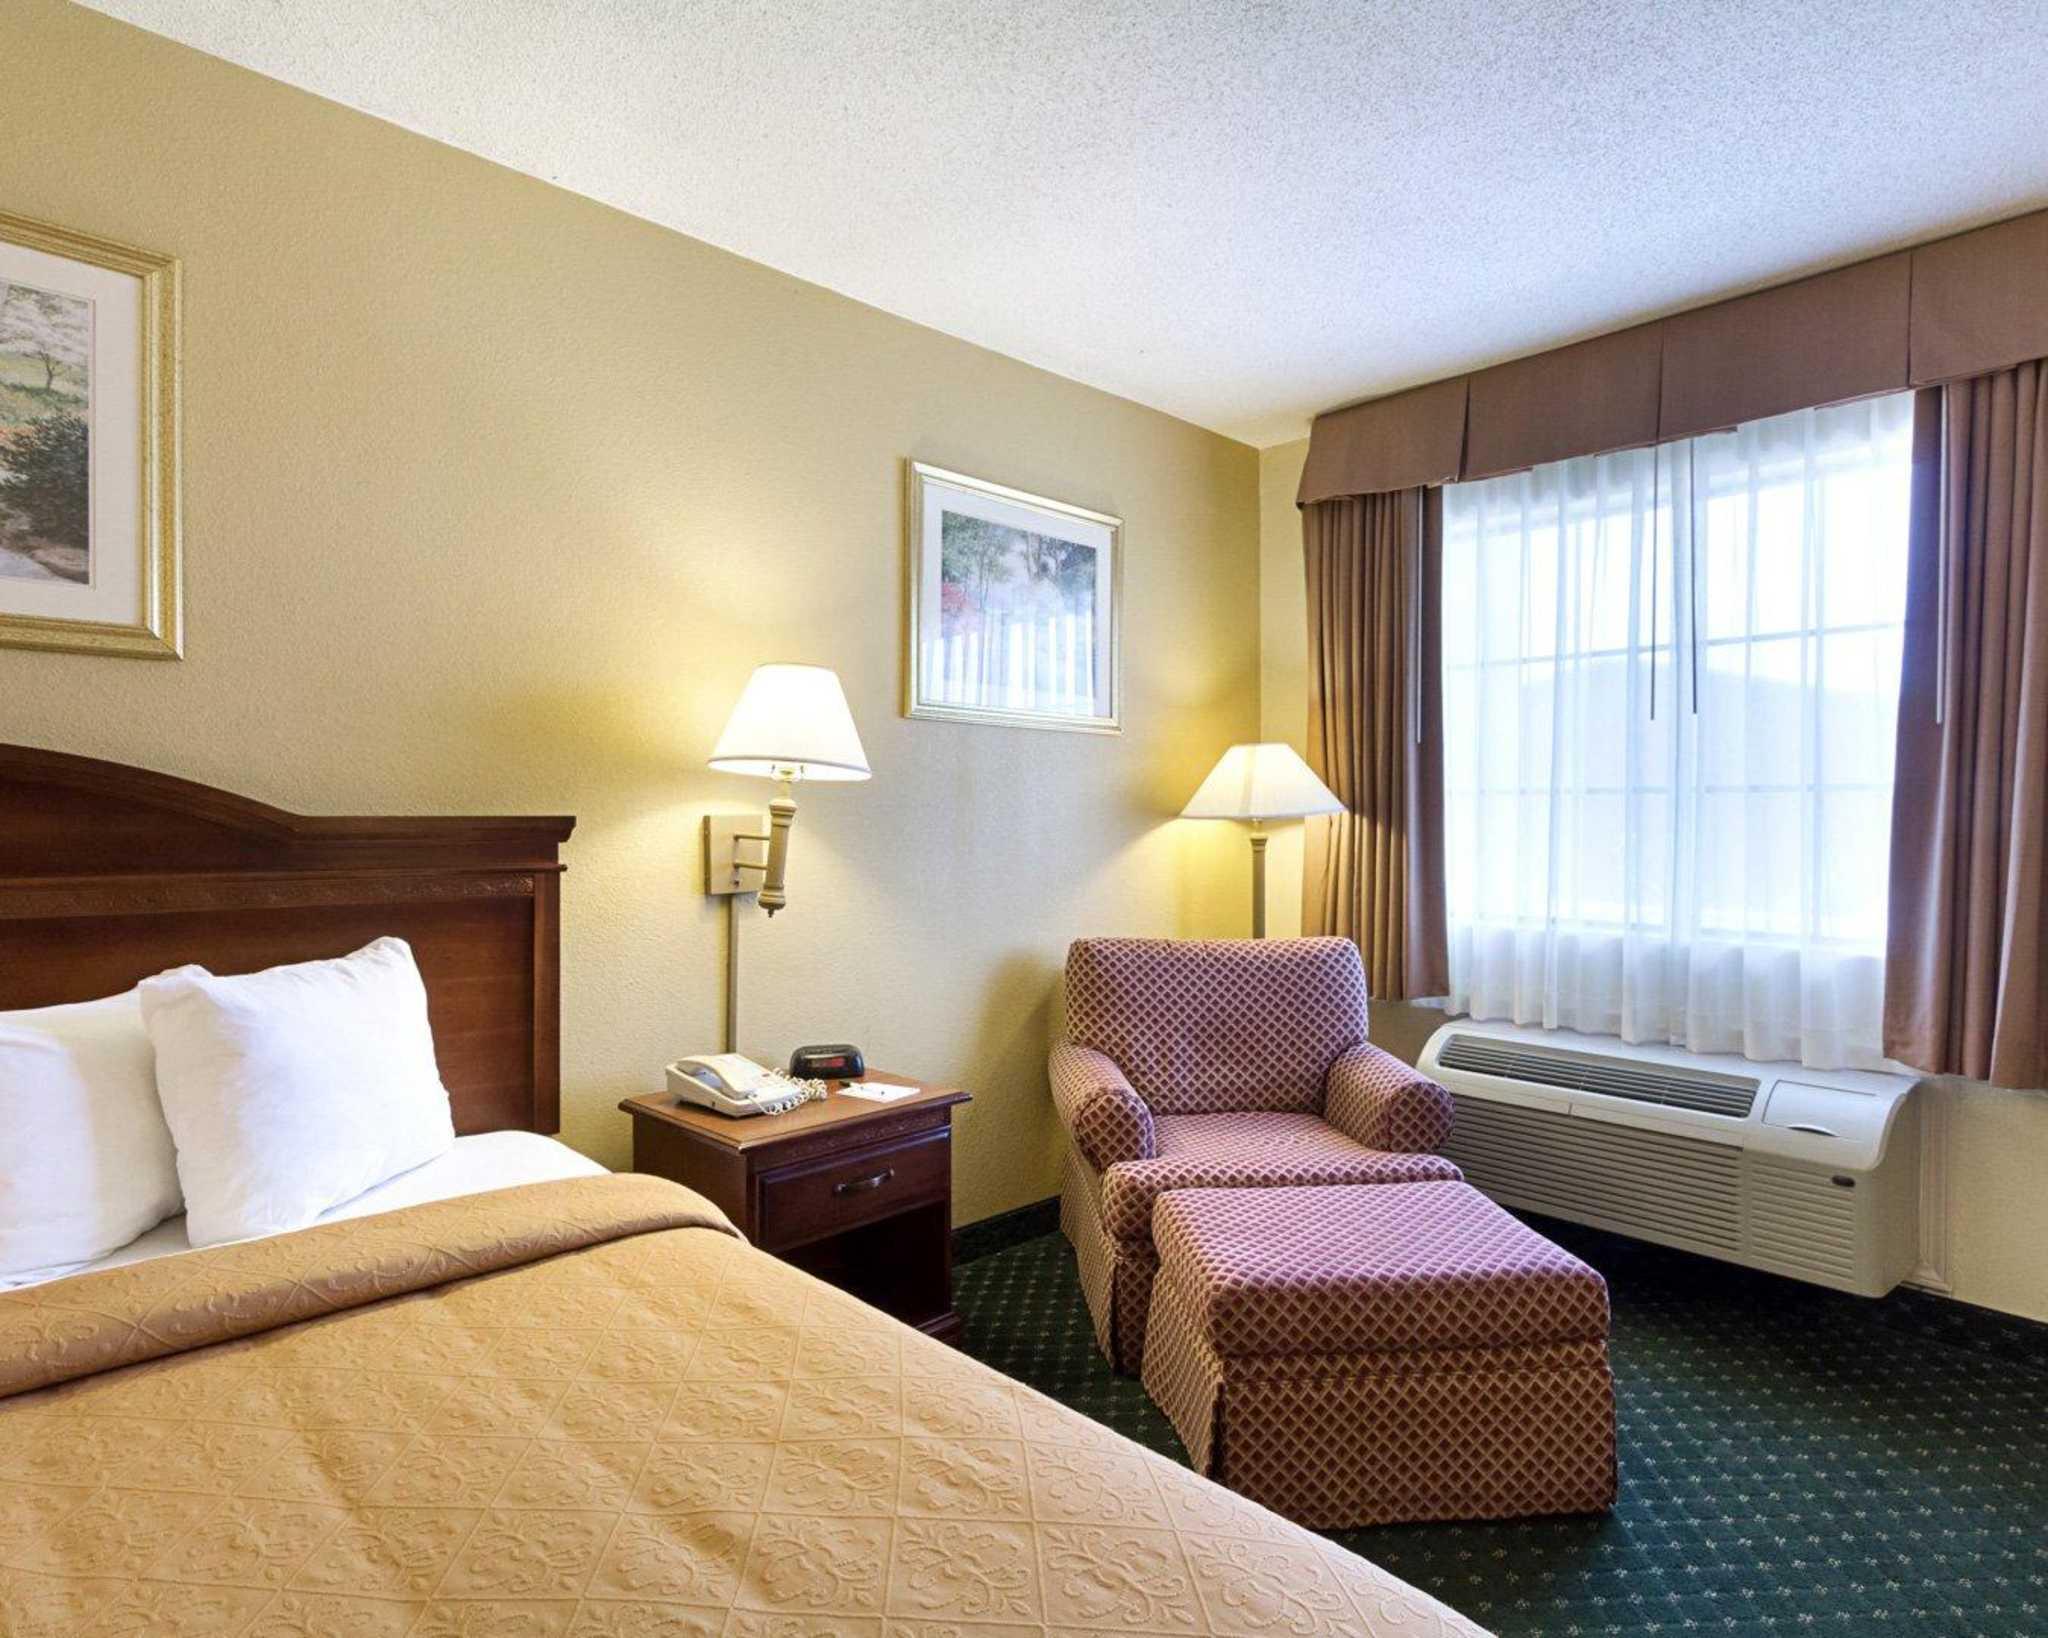 Quality Inn & Suites Southwest image 12